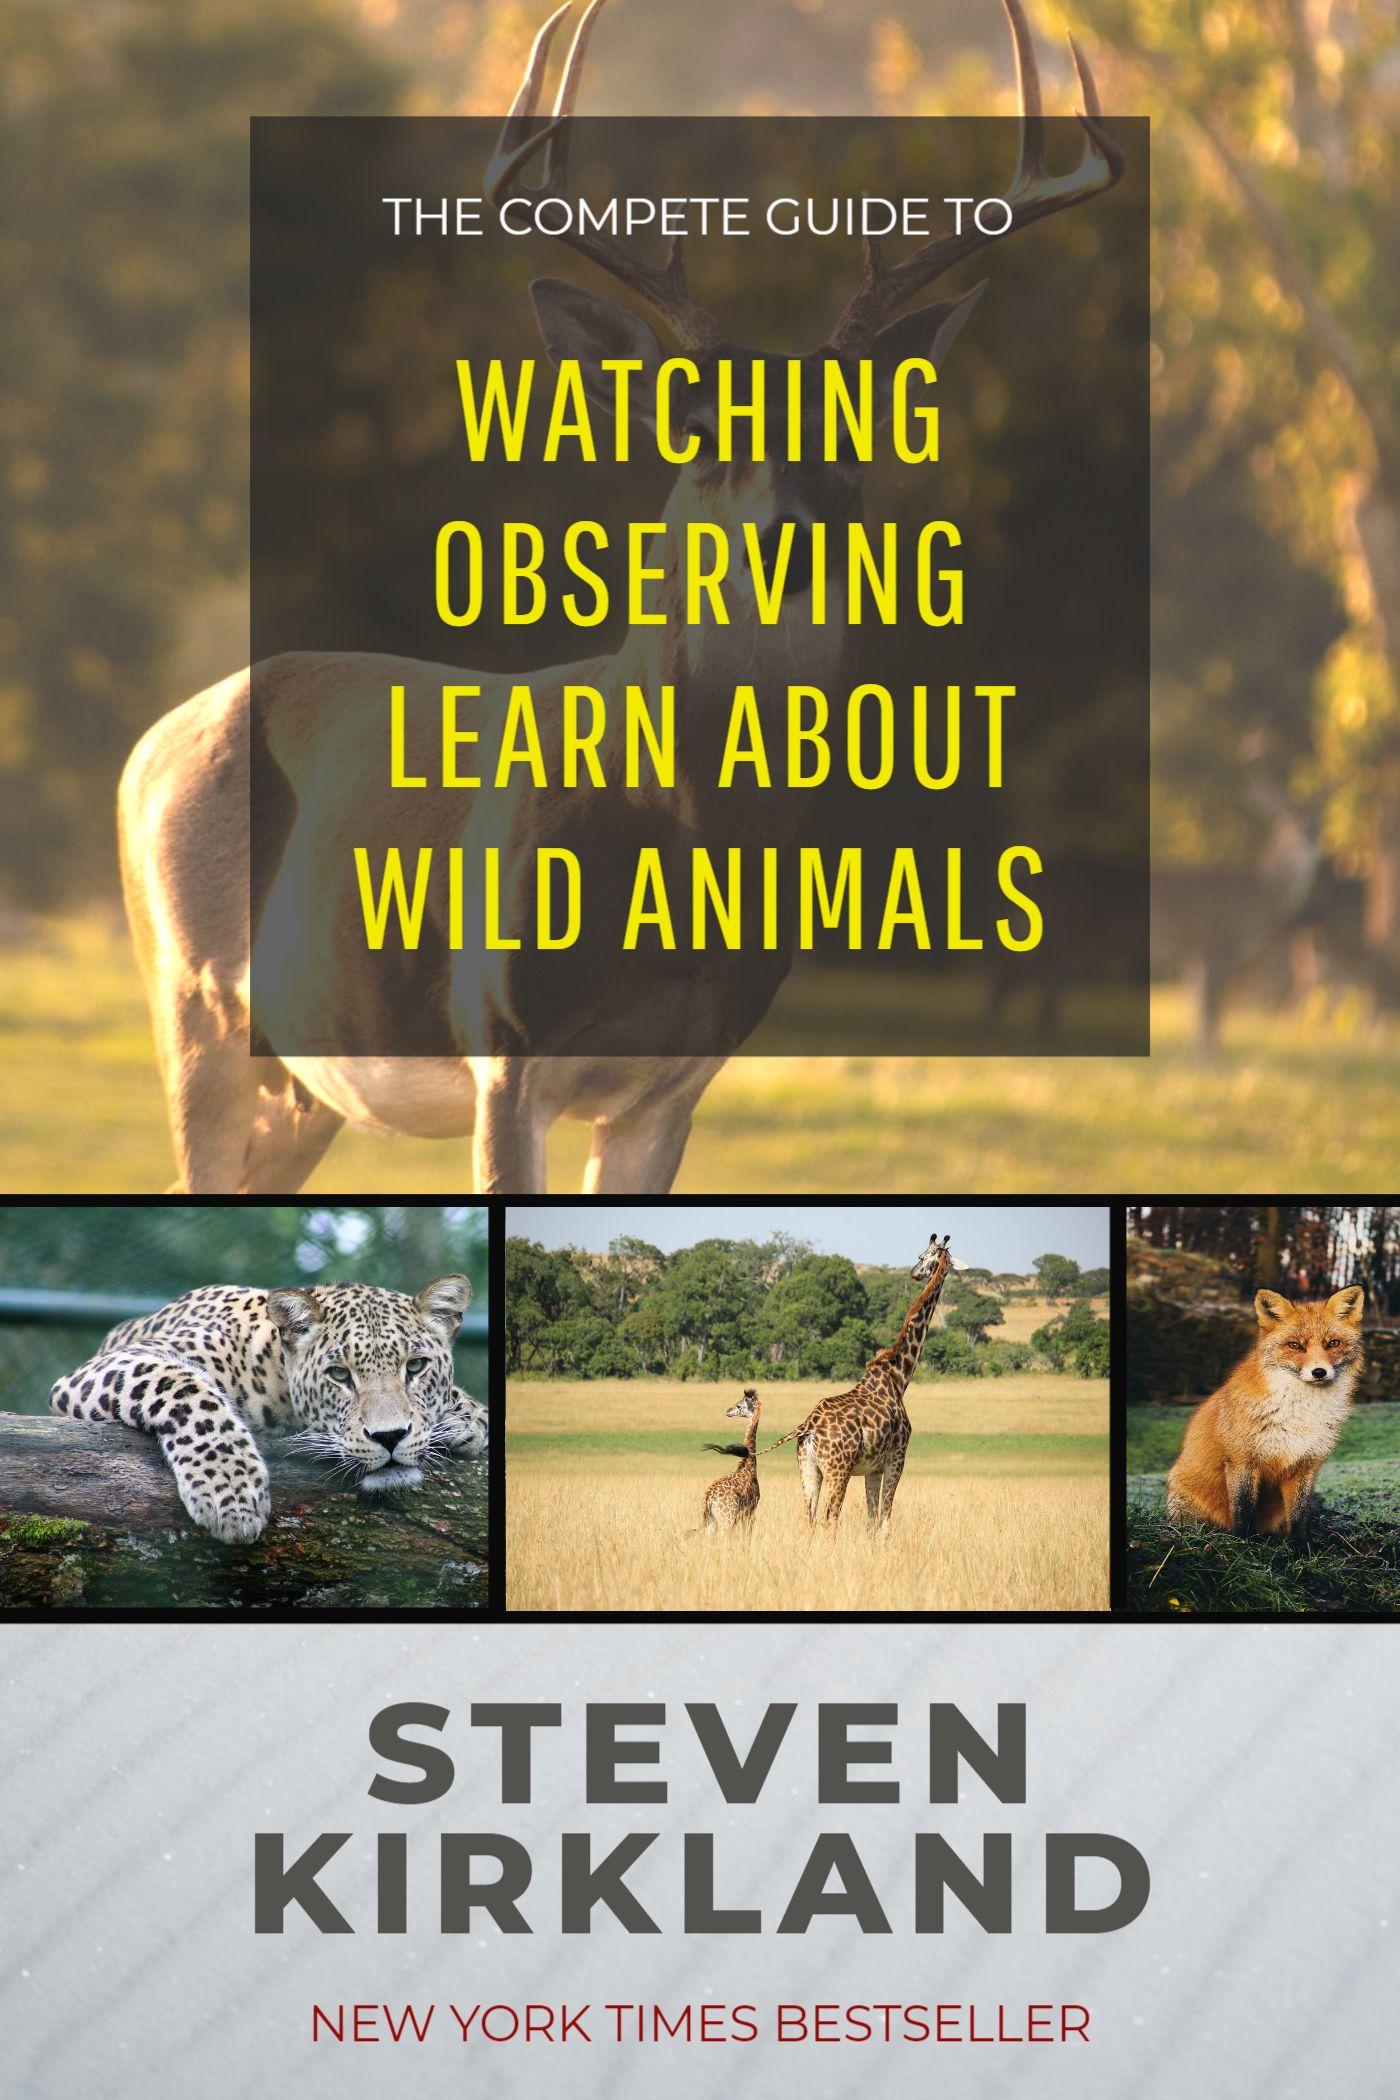 Wild Animals Book Cover Maker